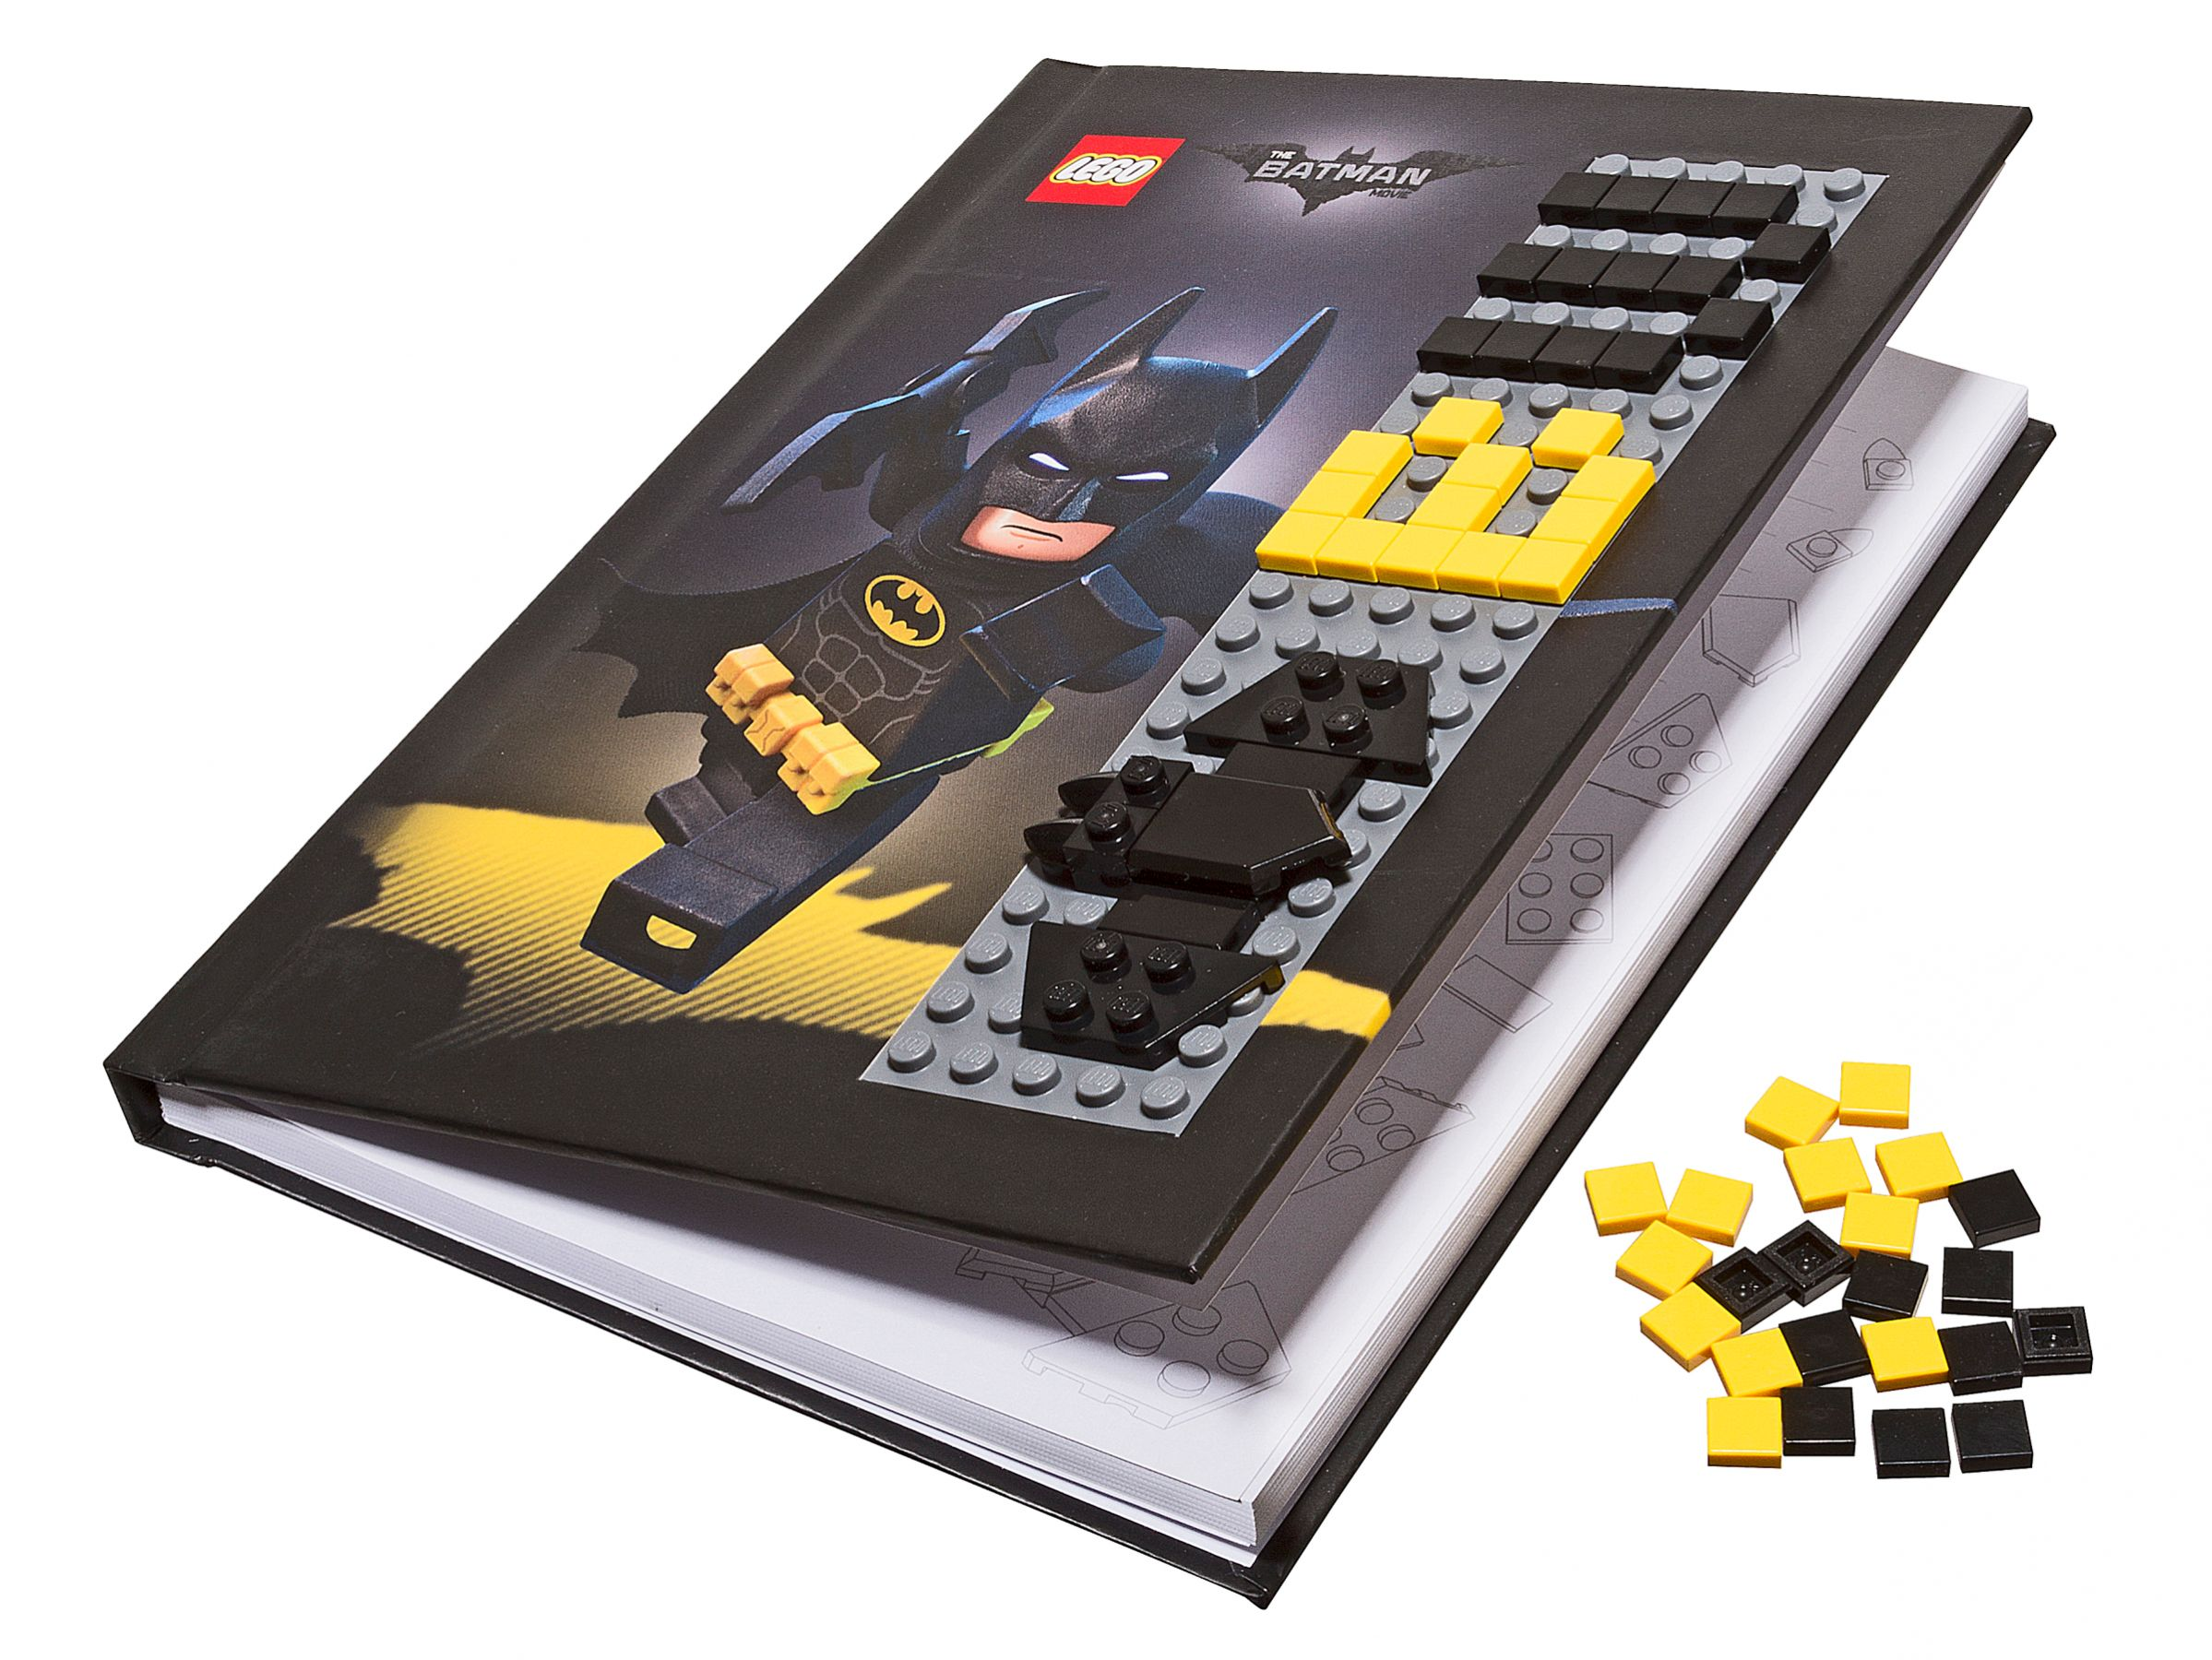 "LEGO® Gear 853649 THE LEGO® BATMAN MOVIE -"" Batman™ Notizbuch mit Noppen"